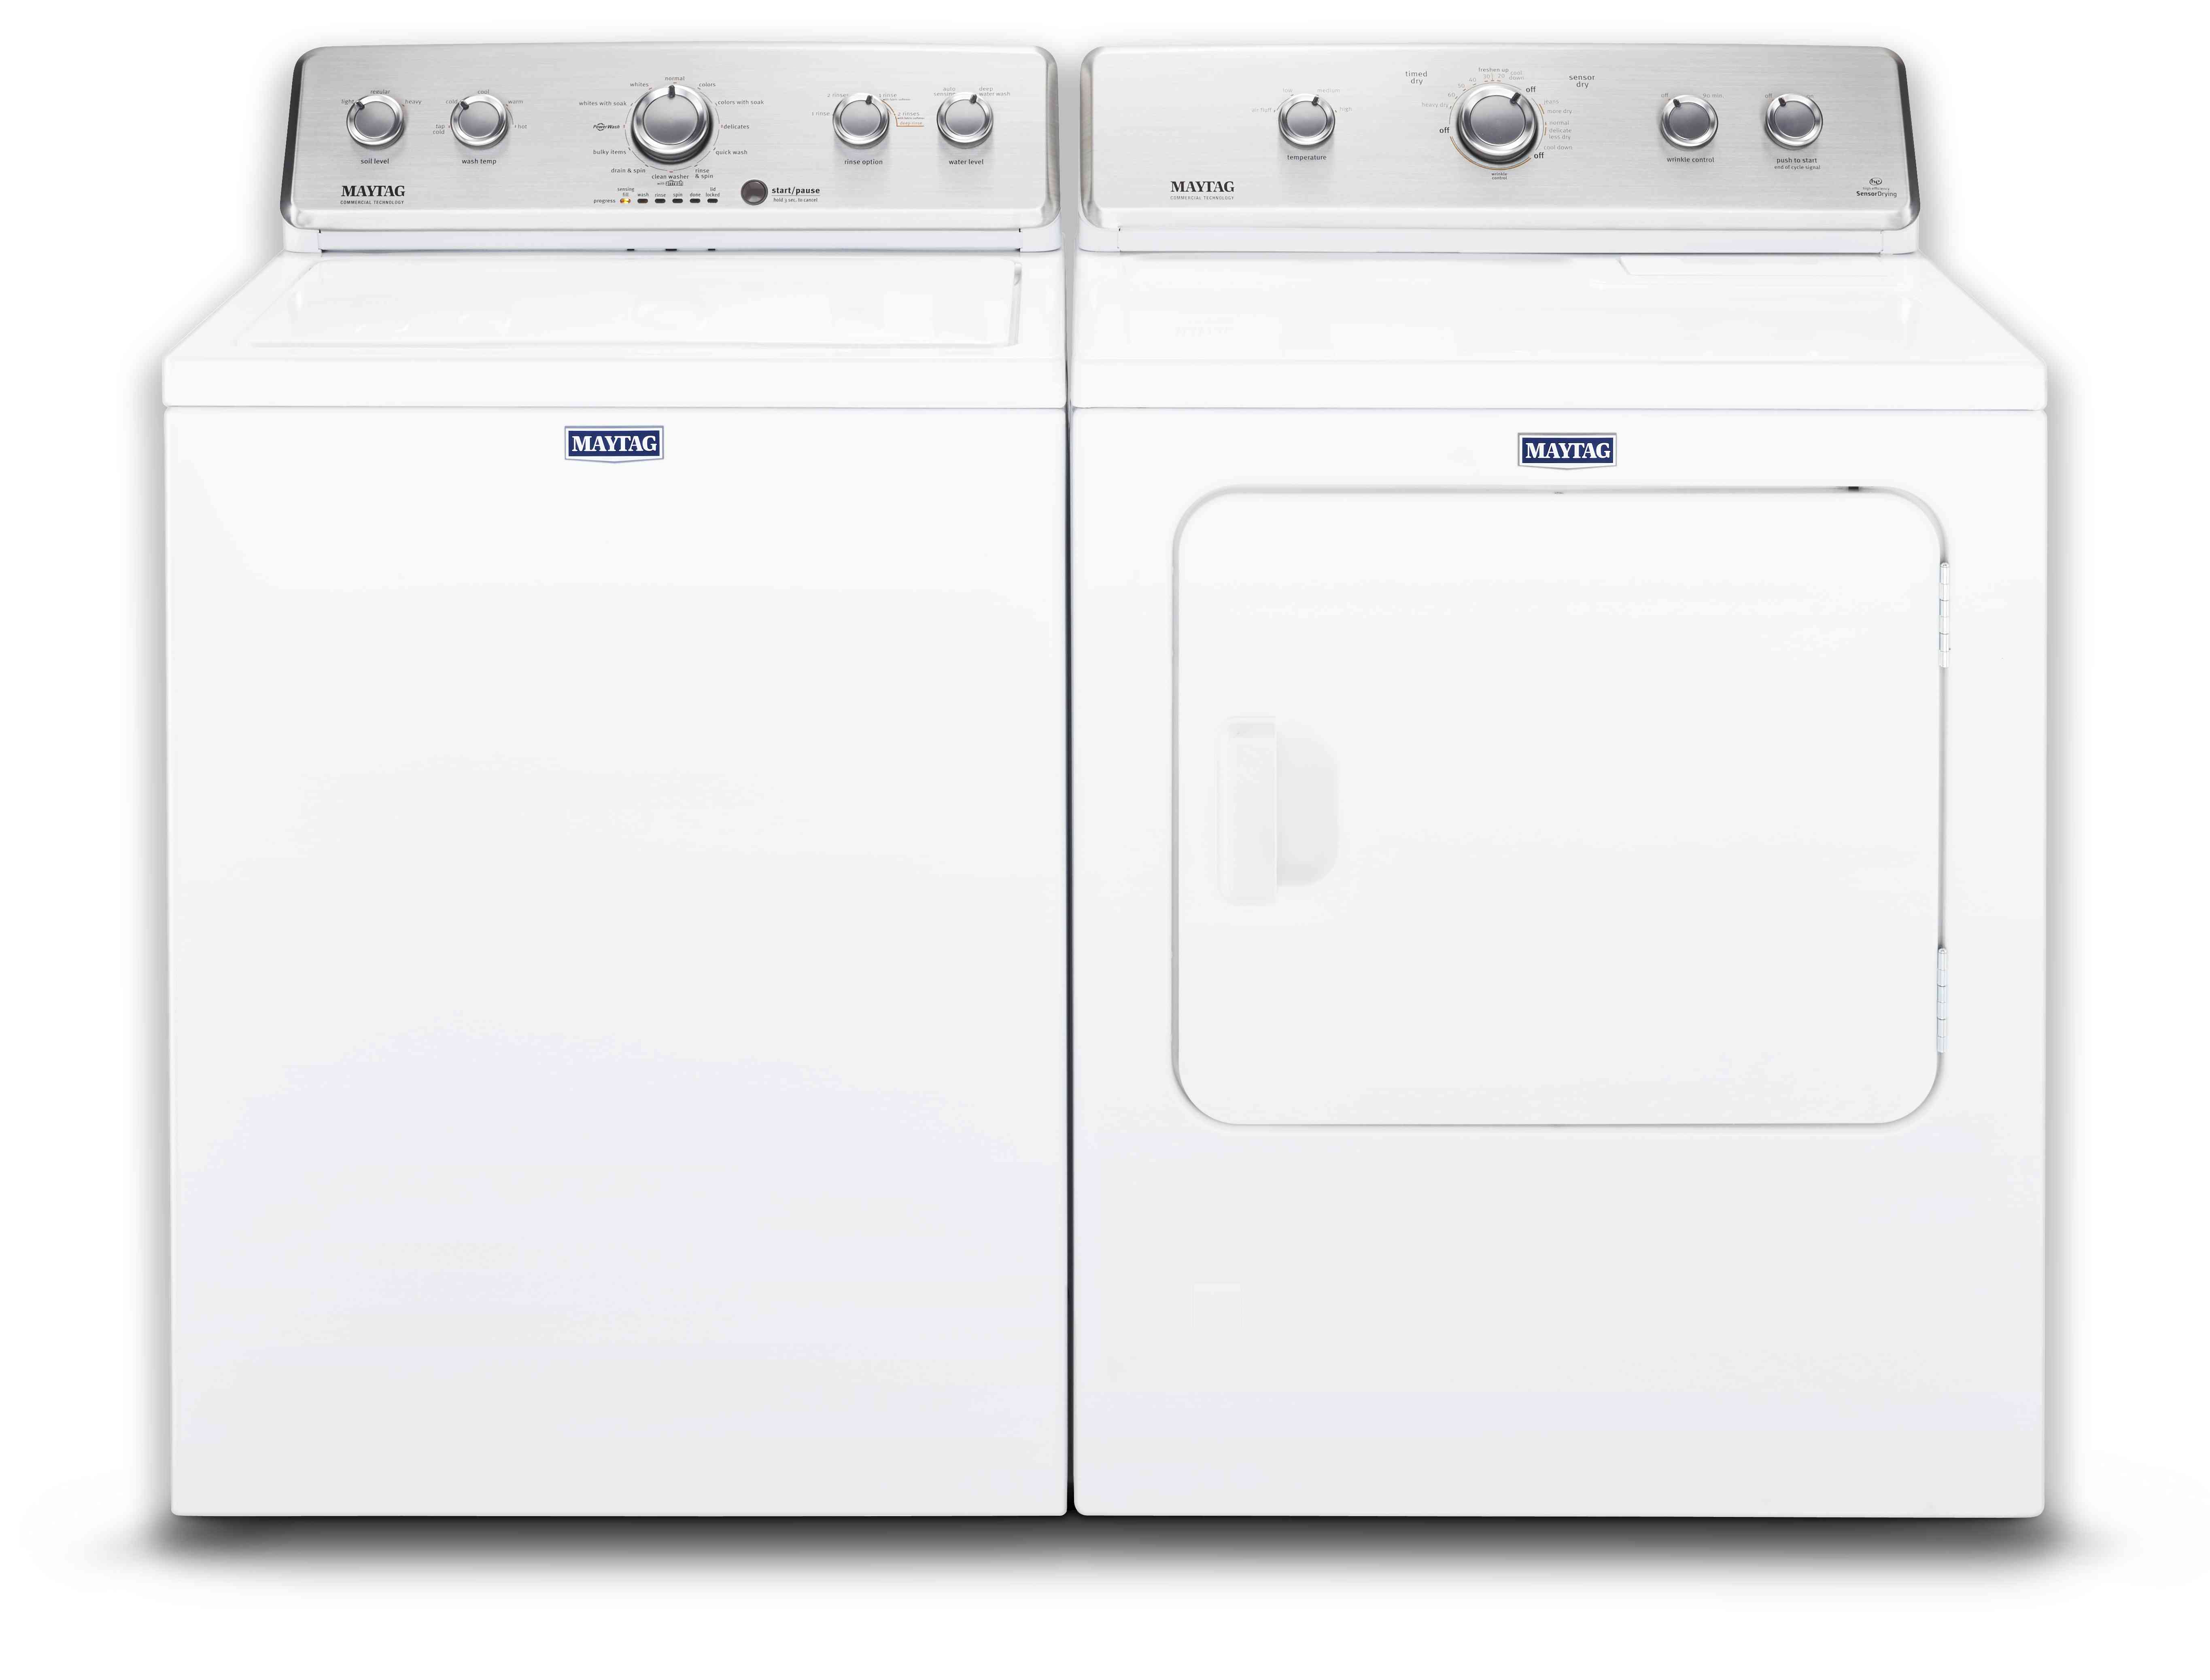 Maytag Washer Dryer in White